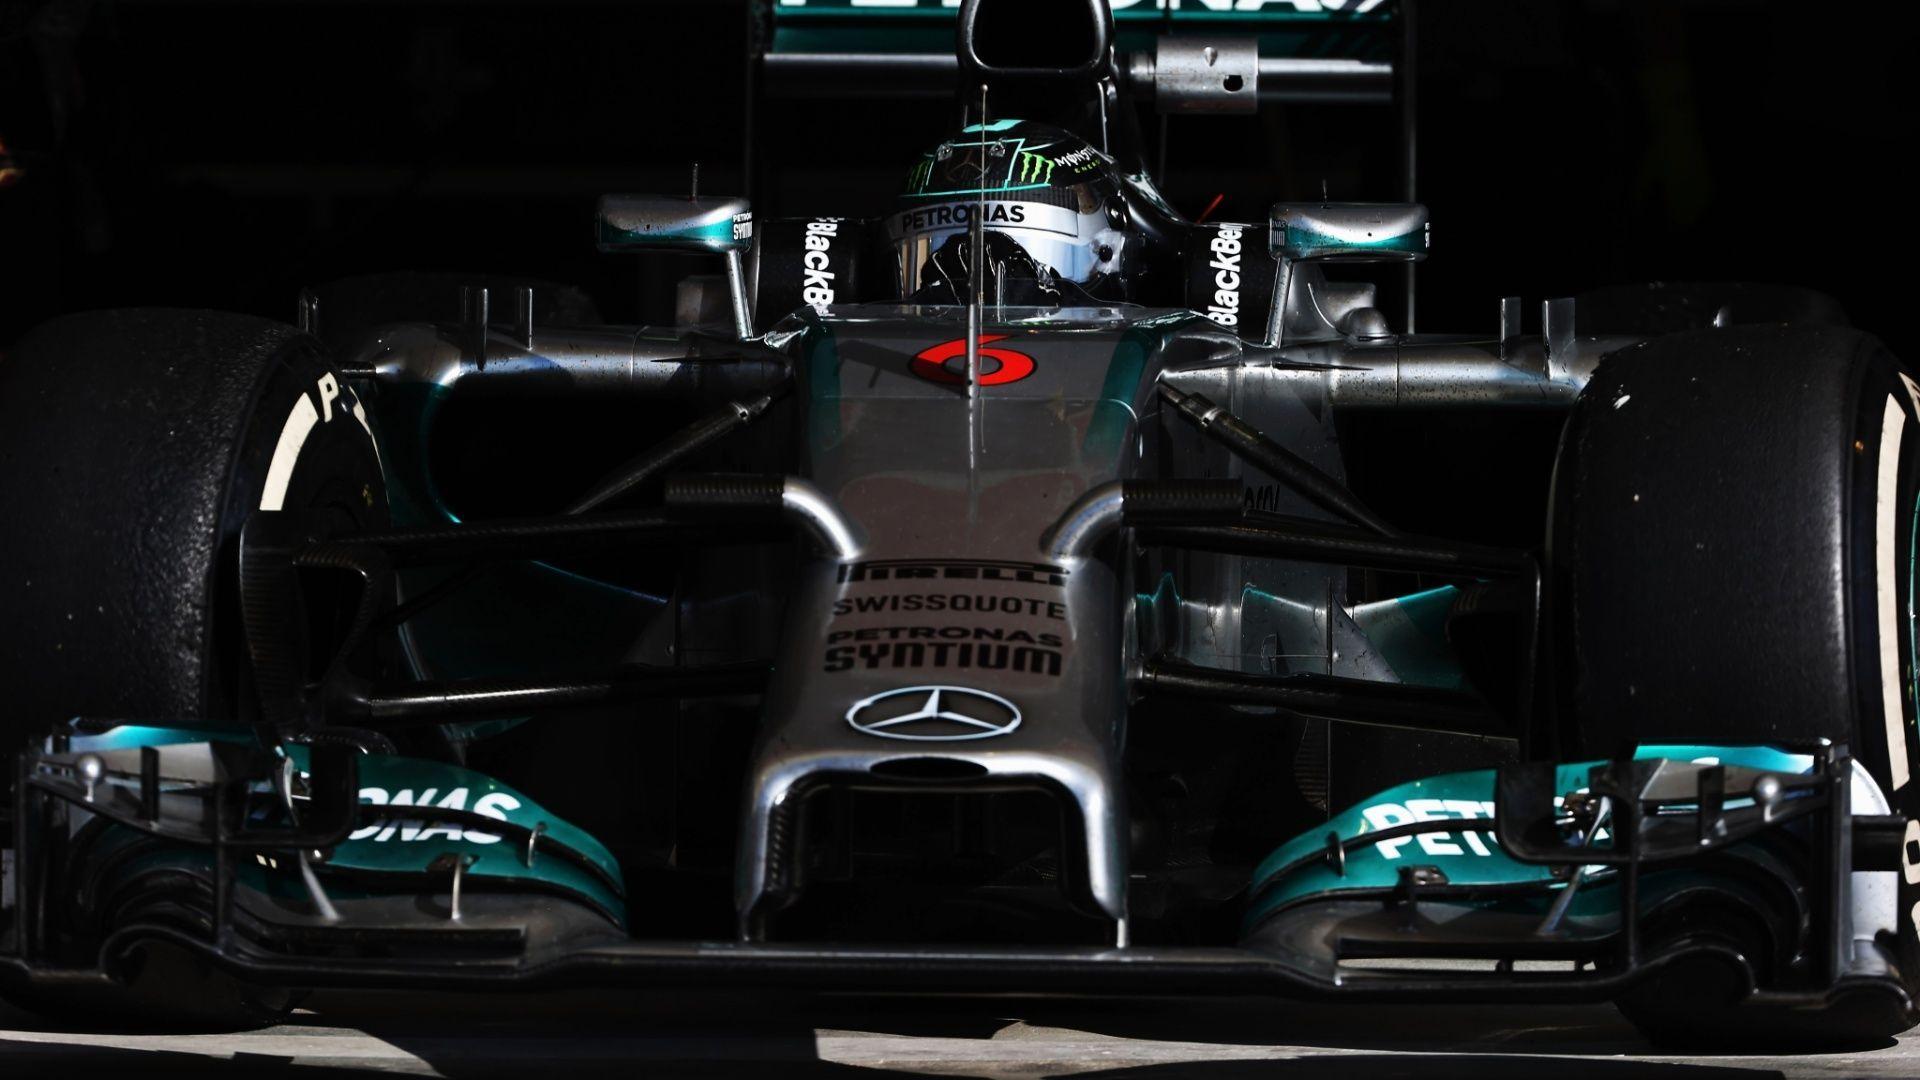 Mercedes-Benz Petronas Background 8